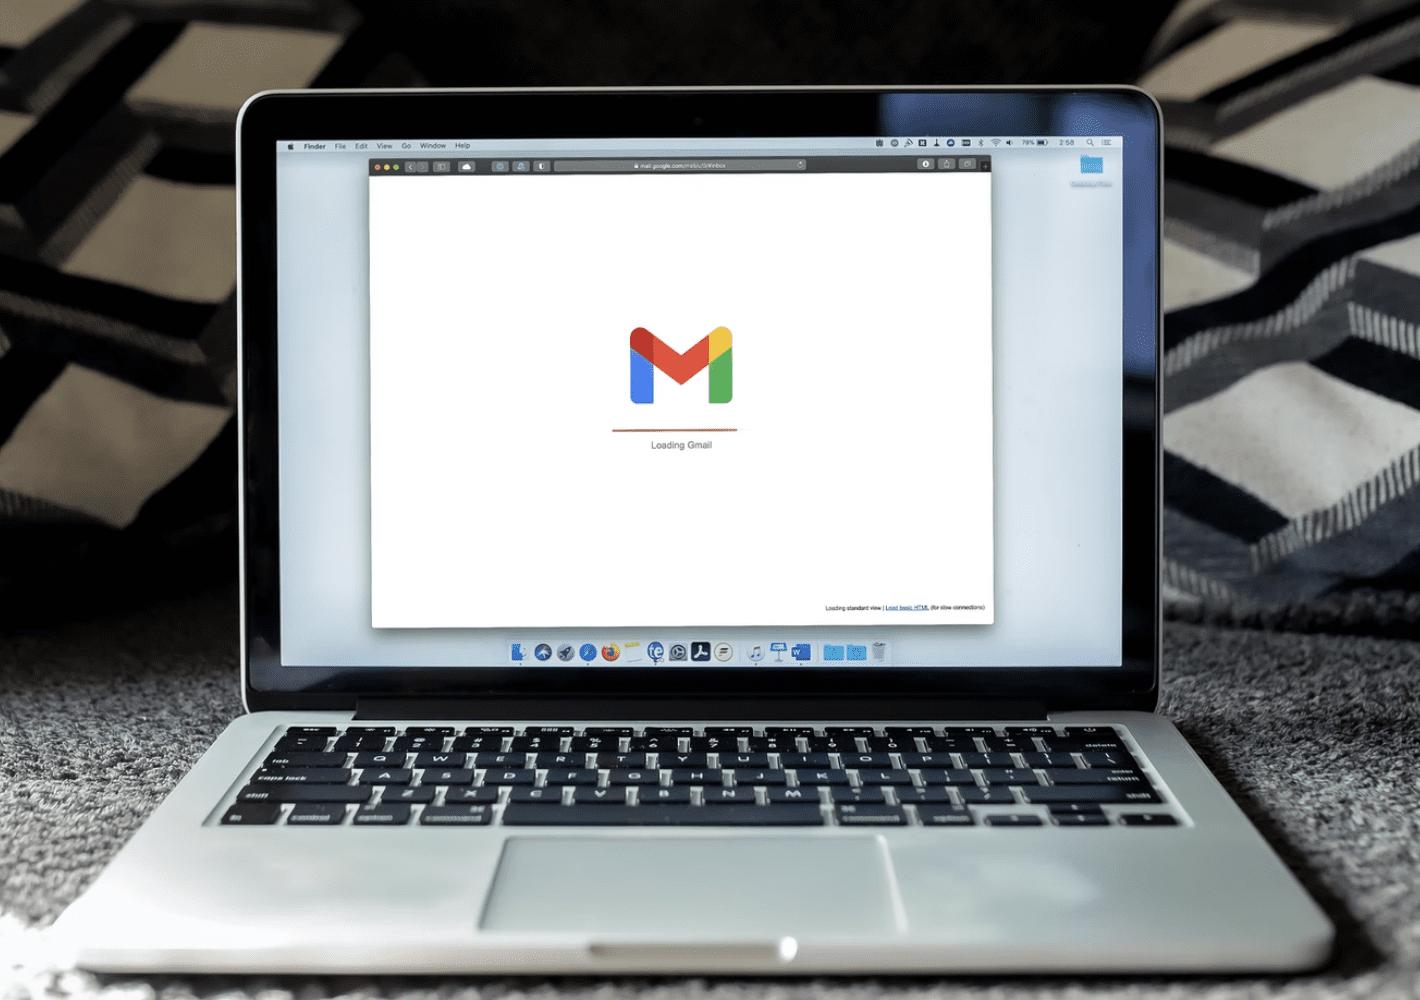 open laptop showing google mail loading screen